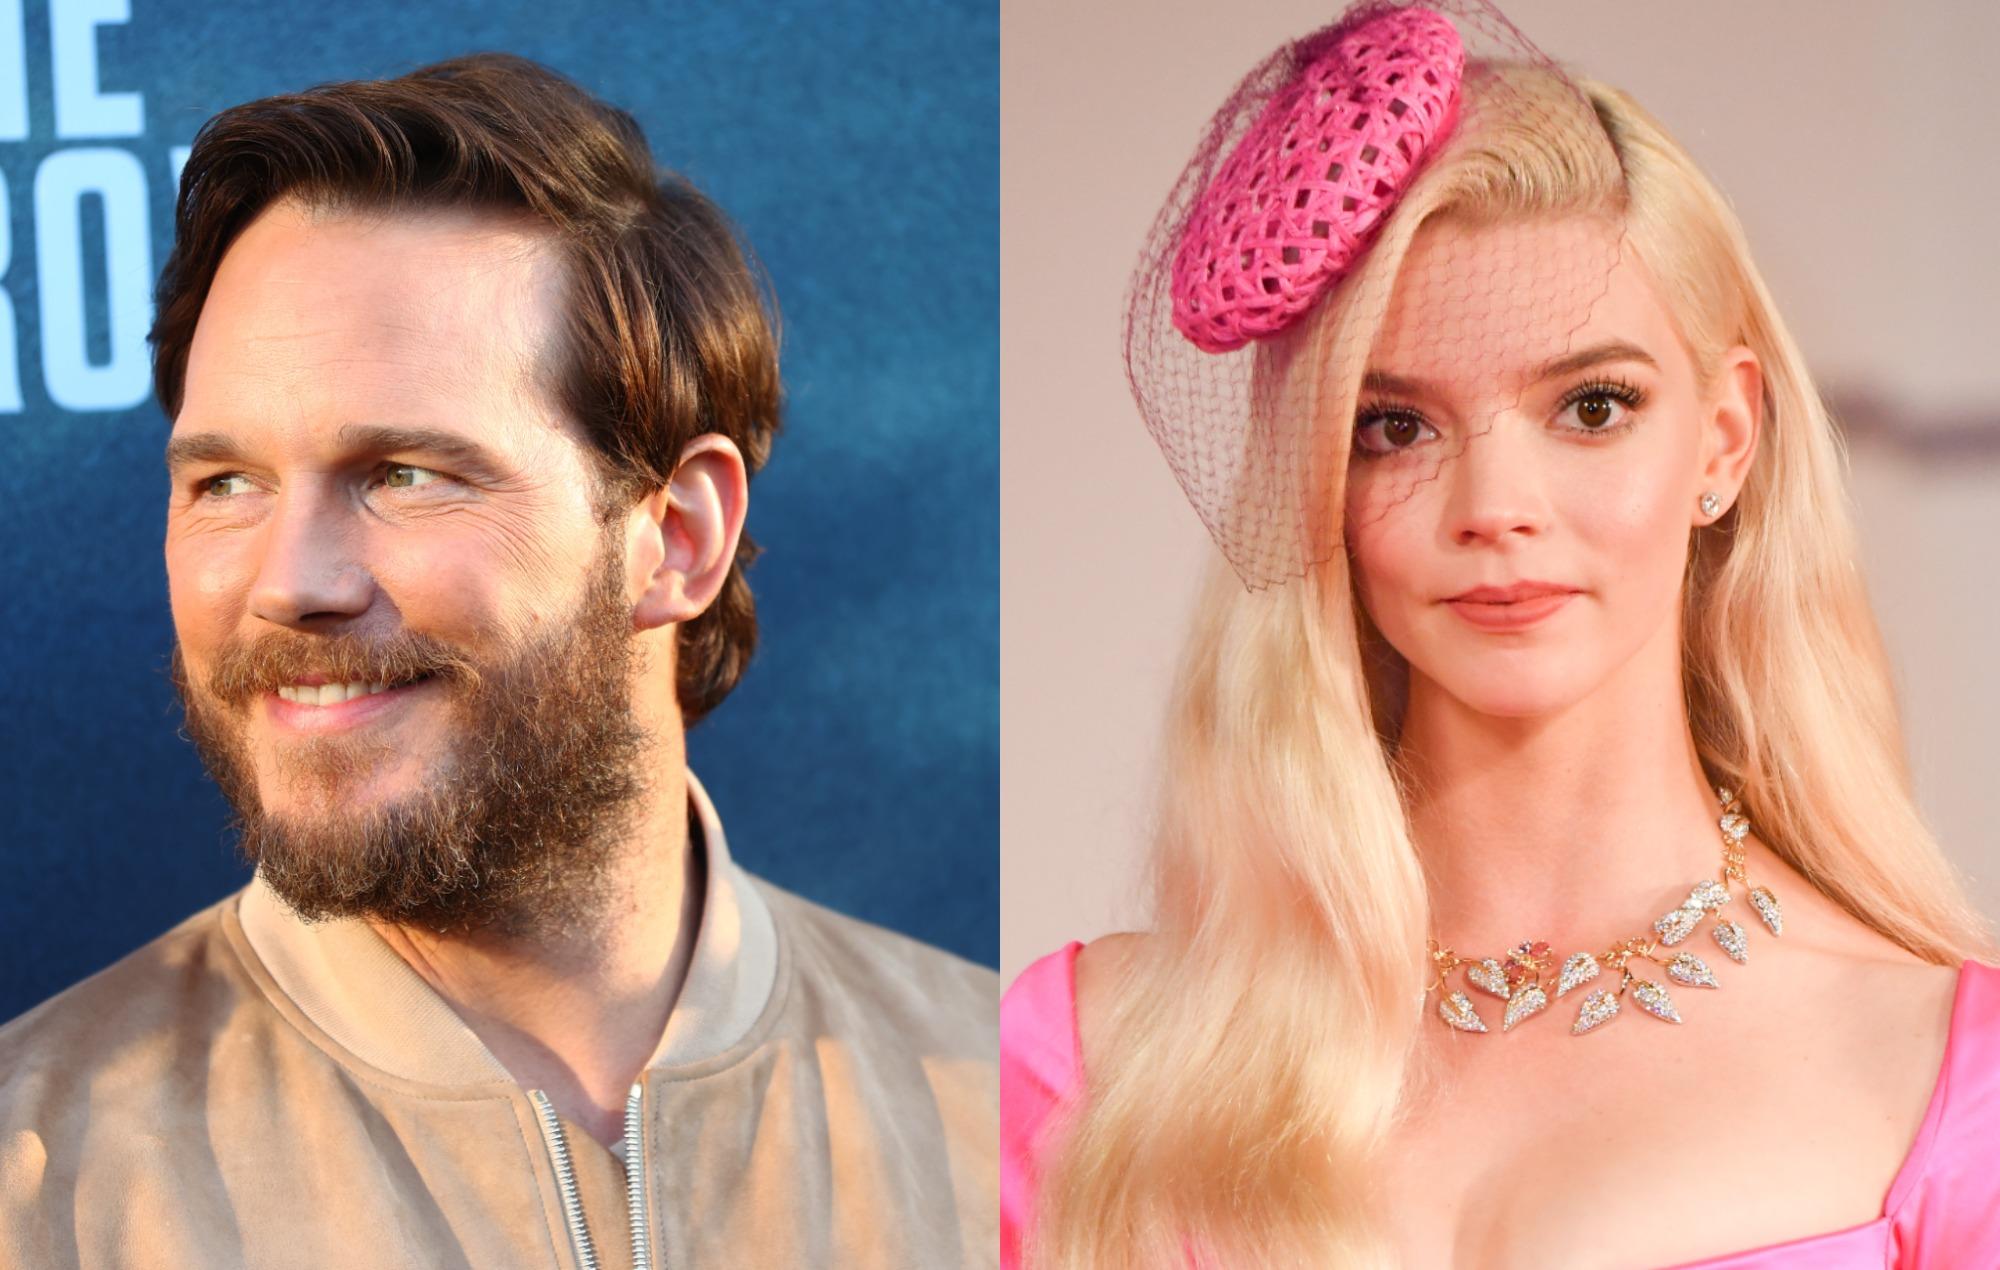 Chris Pratt, Anya Taylor-Joy lead voice cast for animated 'Super Mario Bros.' film - NME